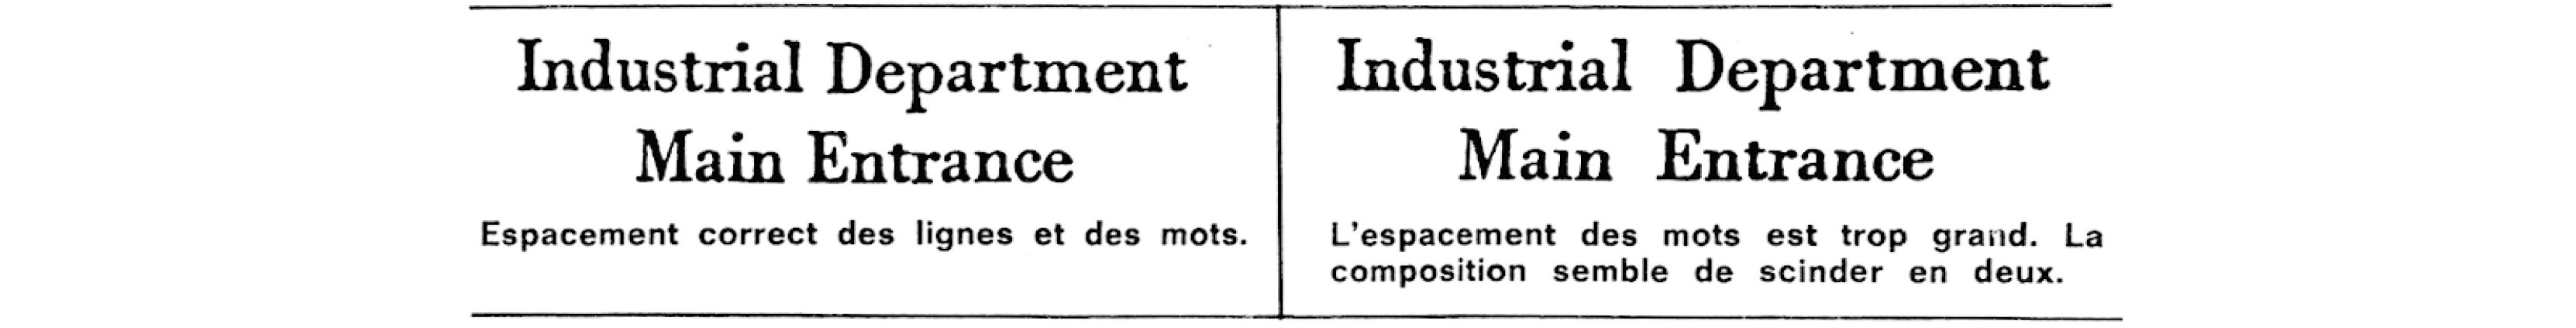 Jan-Tschichold-te-parle-de-typographie-article-Persee-communication-et-langages-1985-schema-06